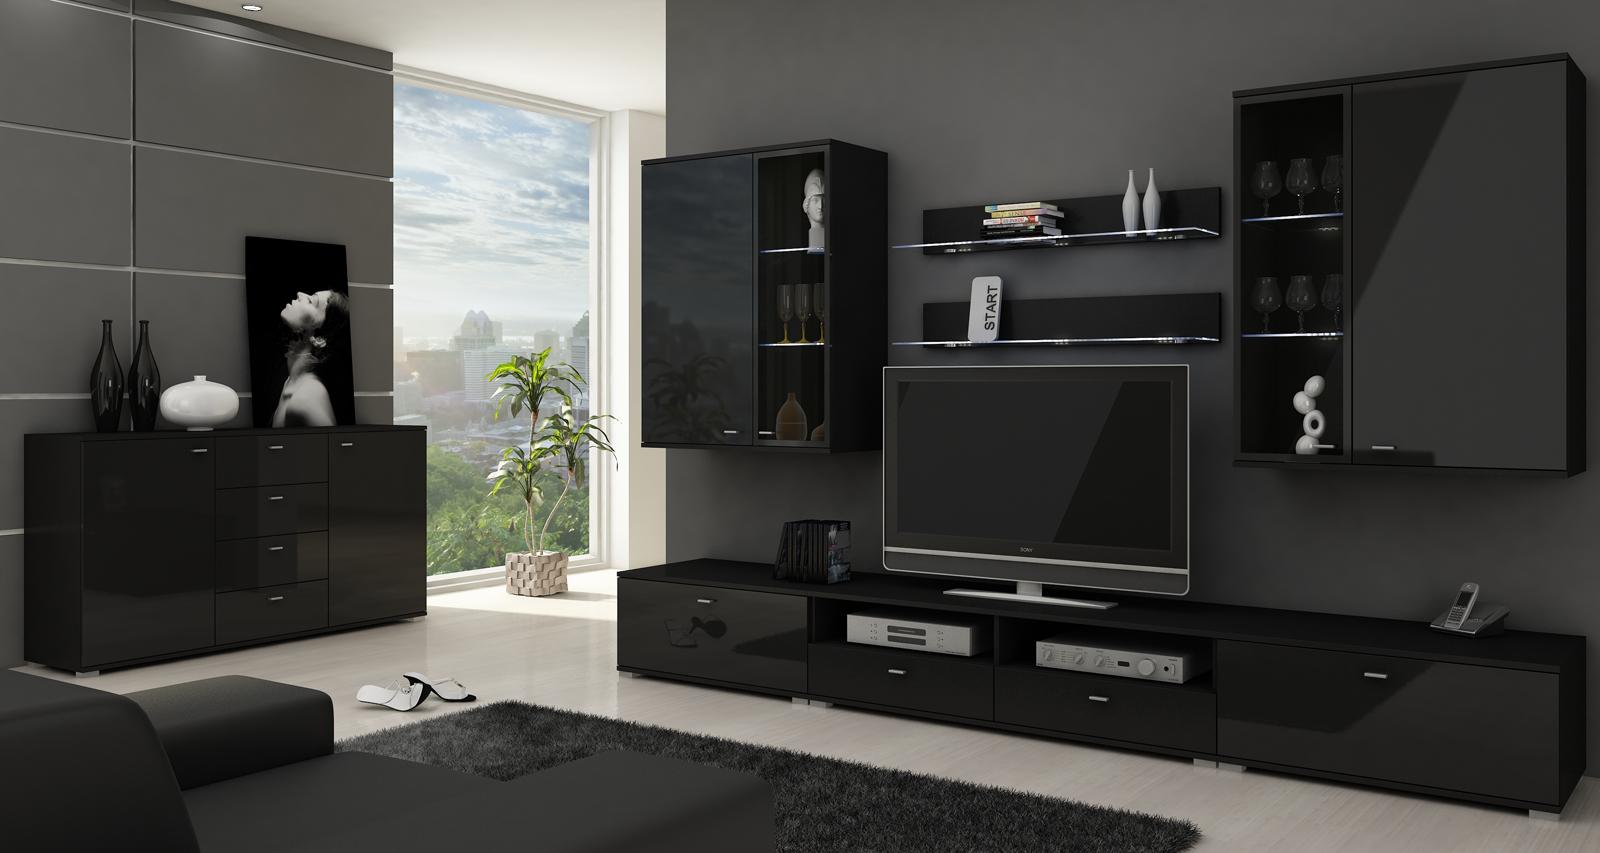 ob vacia stena erfurt ierna nov n. Black Bedroom Furniture Sets. Home Design Ideas